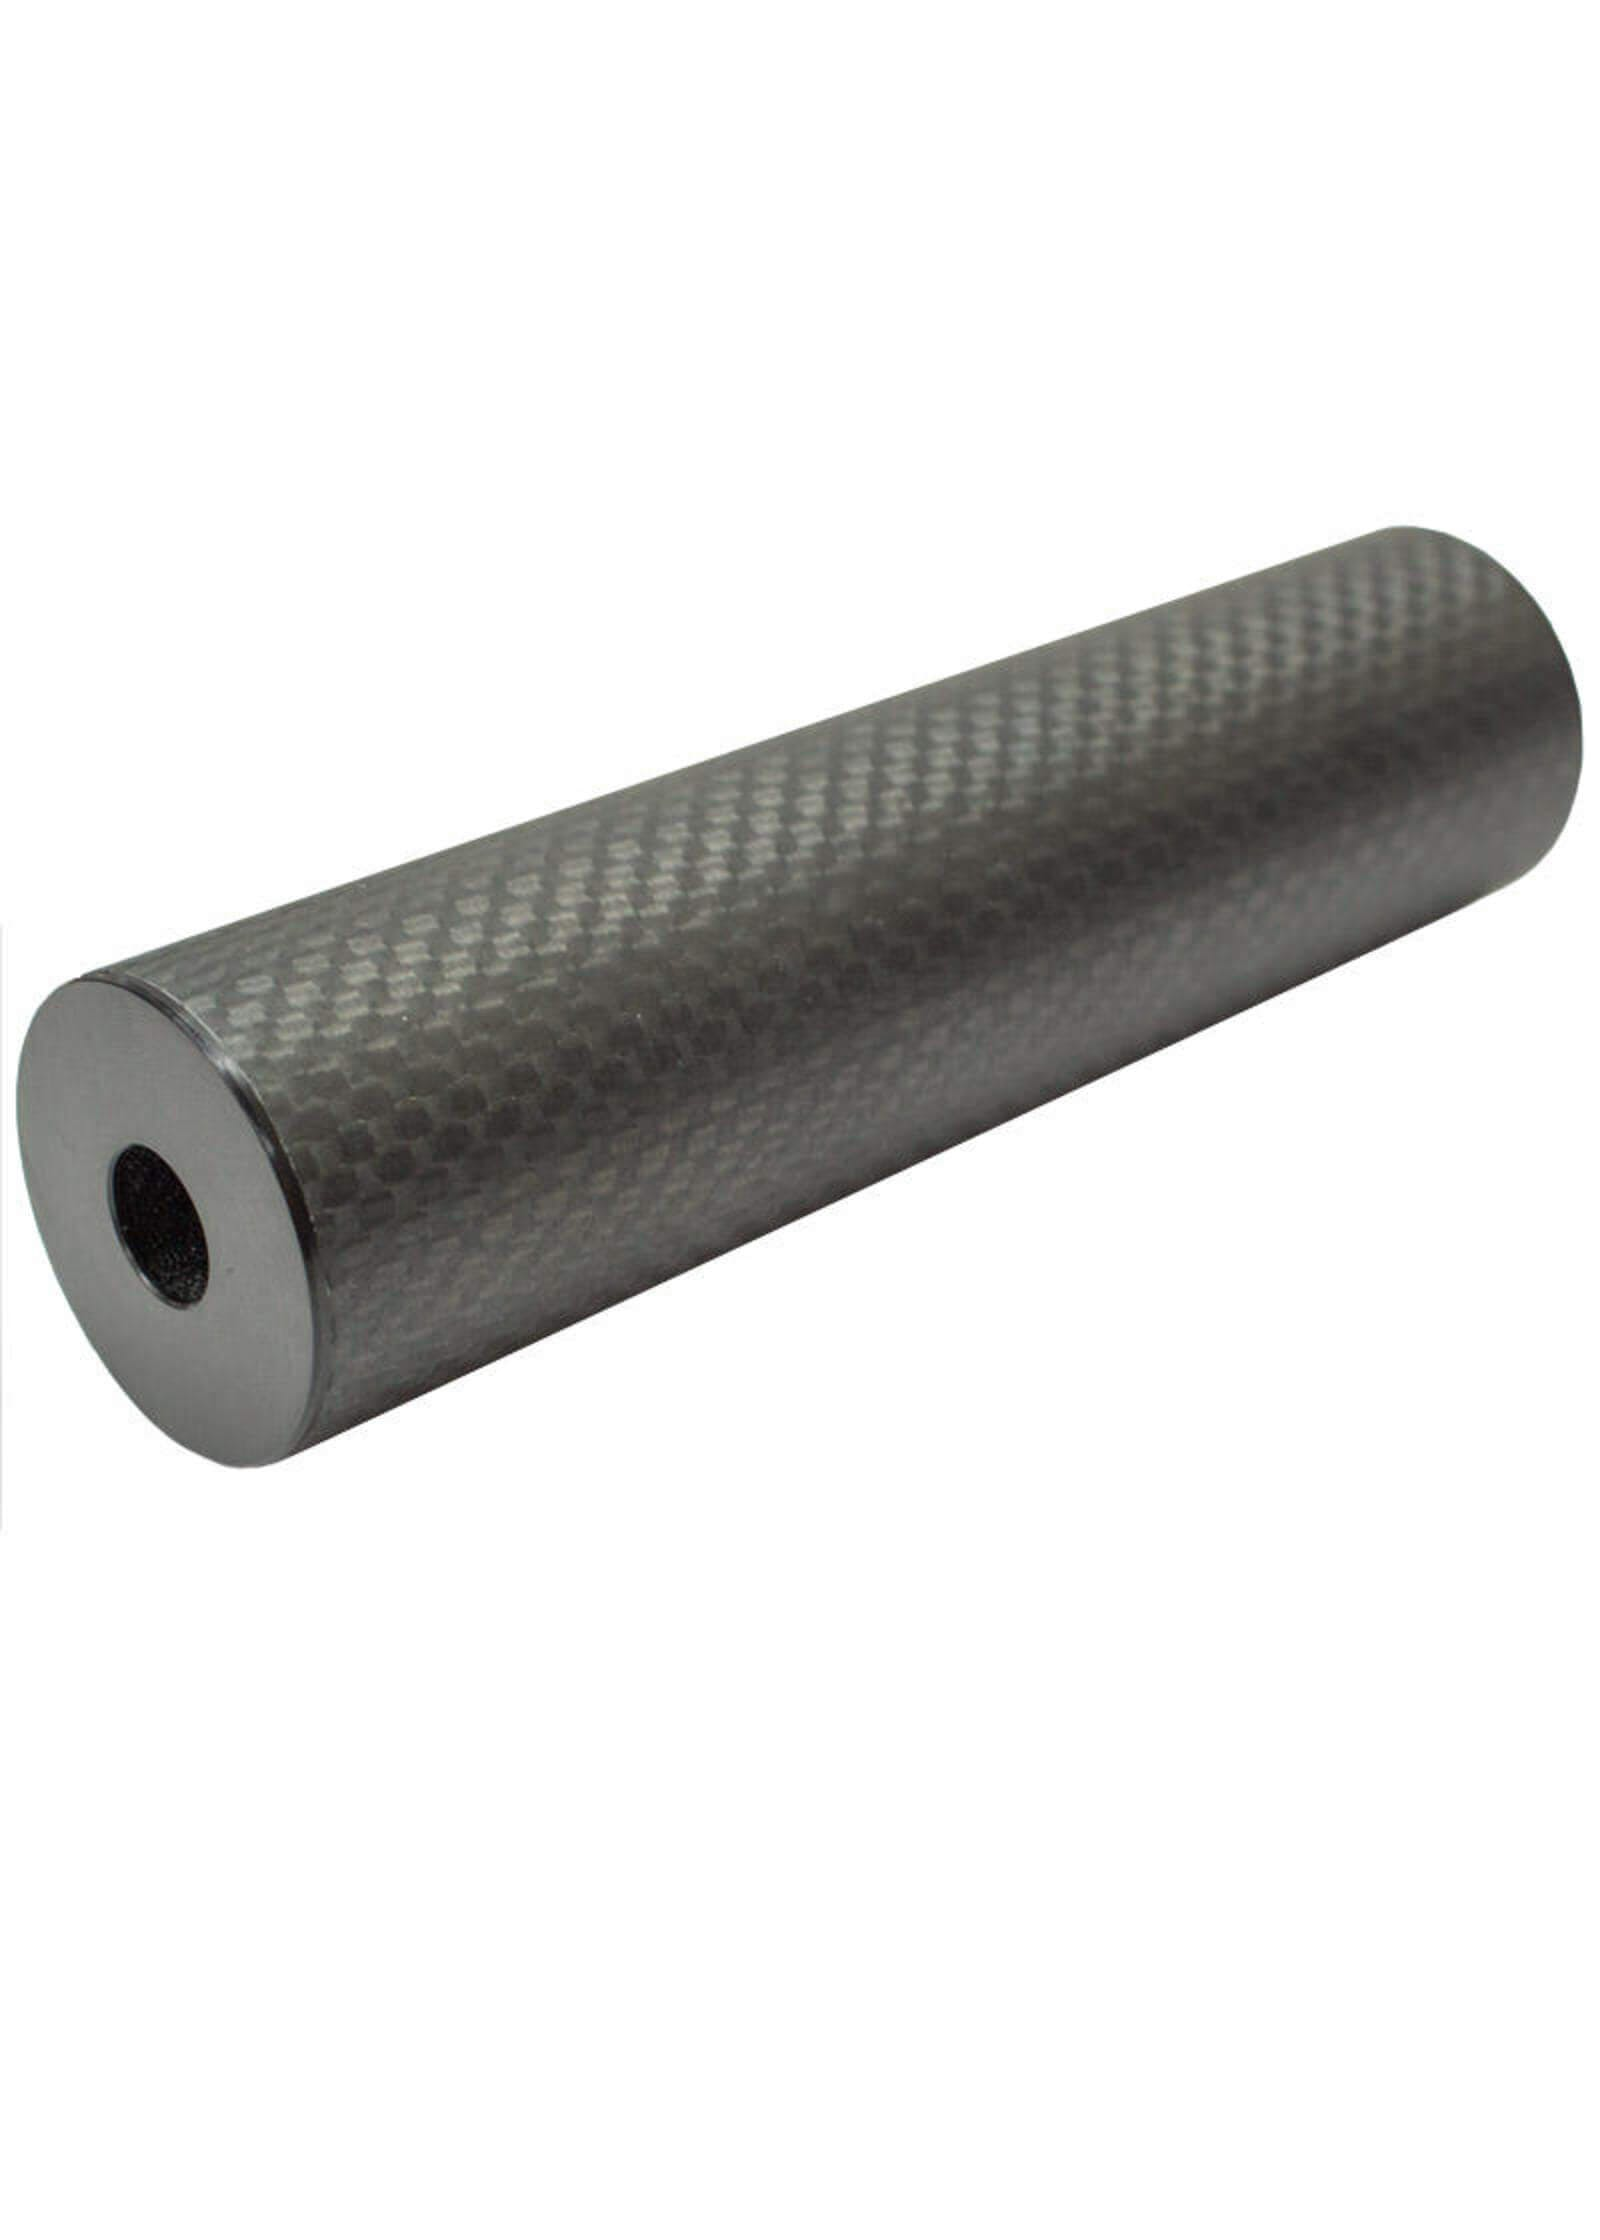 Carbon Fiber Mock Dummy Sound Suppressor Silencer 14mm Thread Airsoft